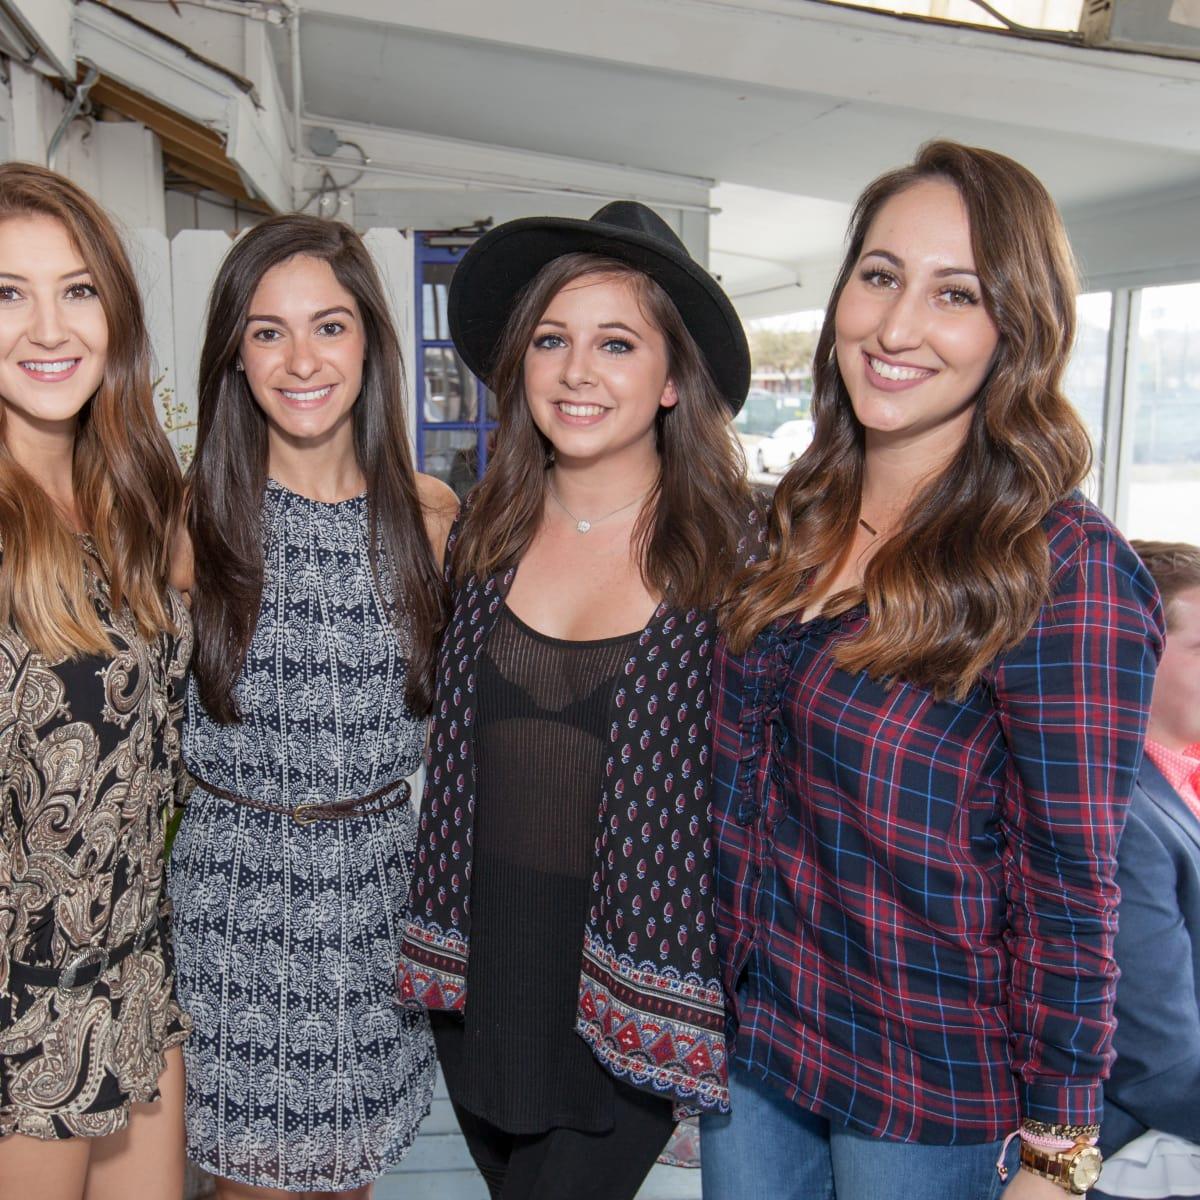 Durham House brunch, March 2016, Lauren Leal, Rachel Remington, Sara Malloy, Allison Reynolds